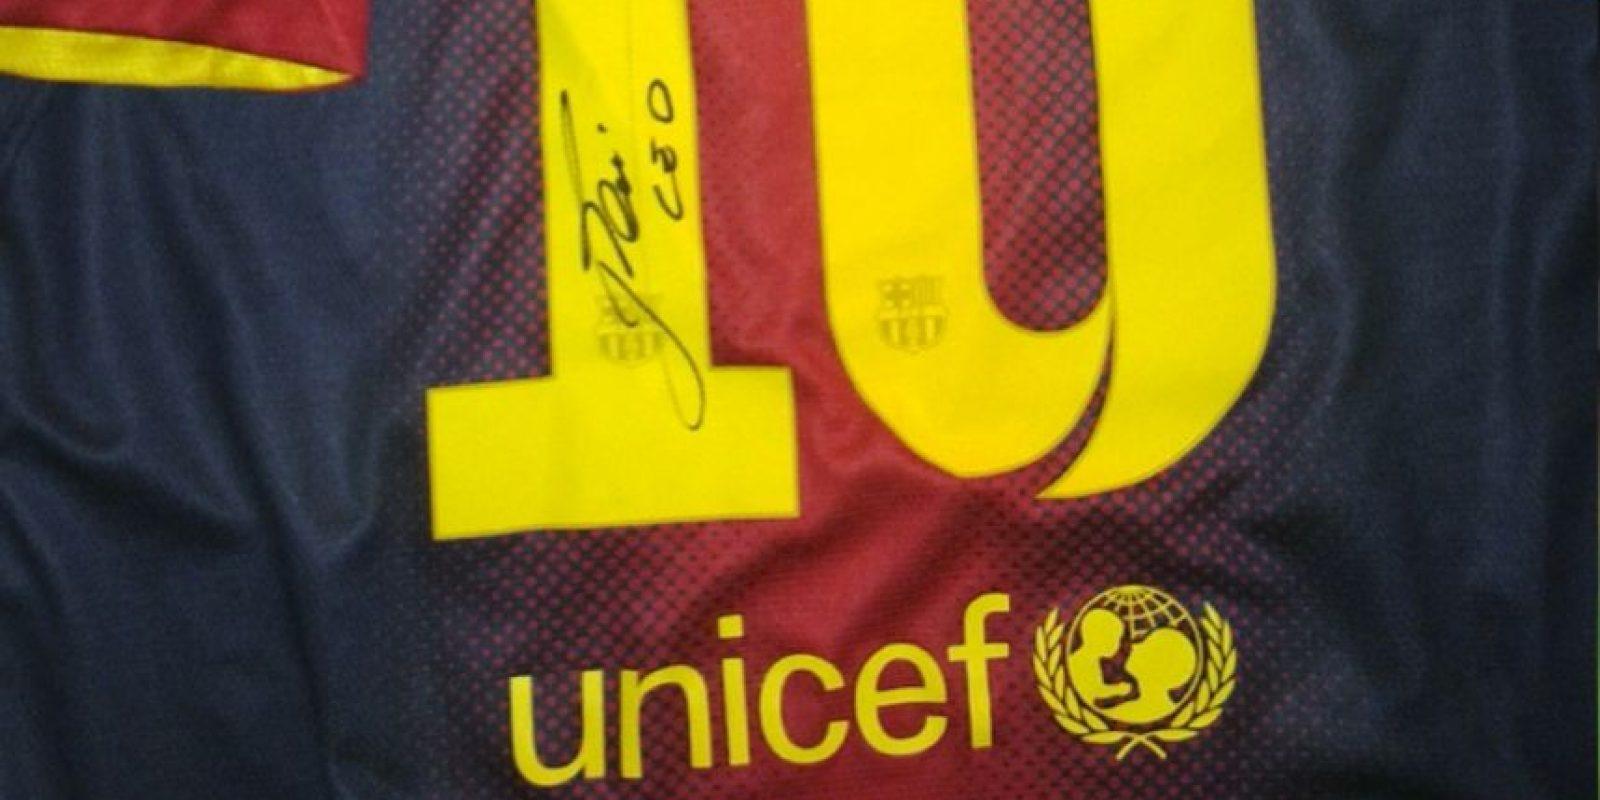 La firma de Leo está en la parte trasera de la camiseta. Foto:unitedcharity.de